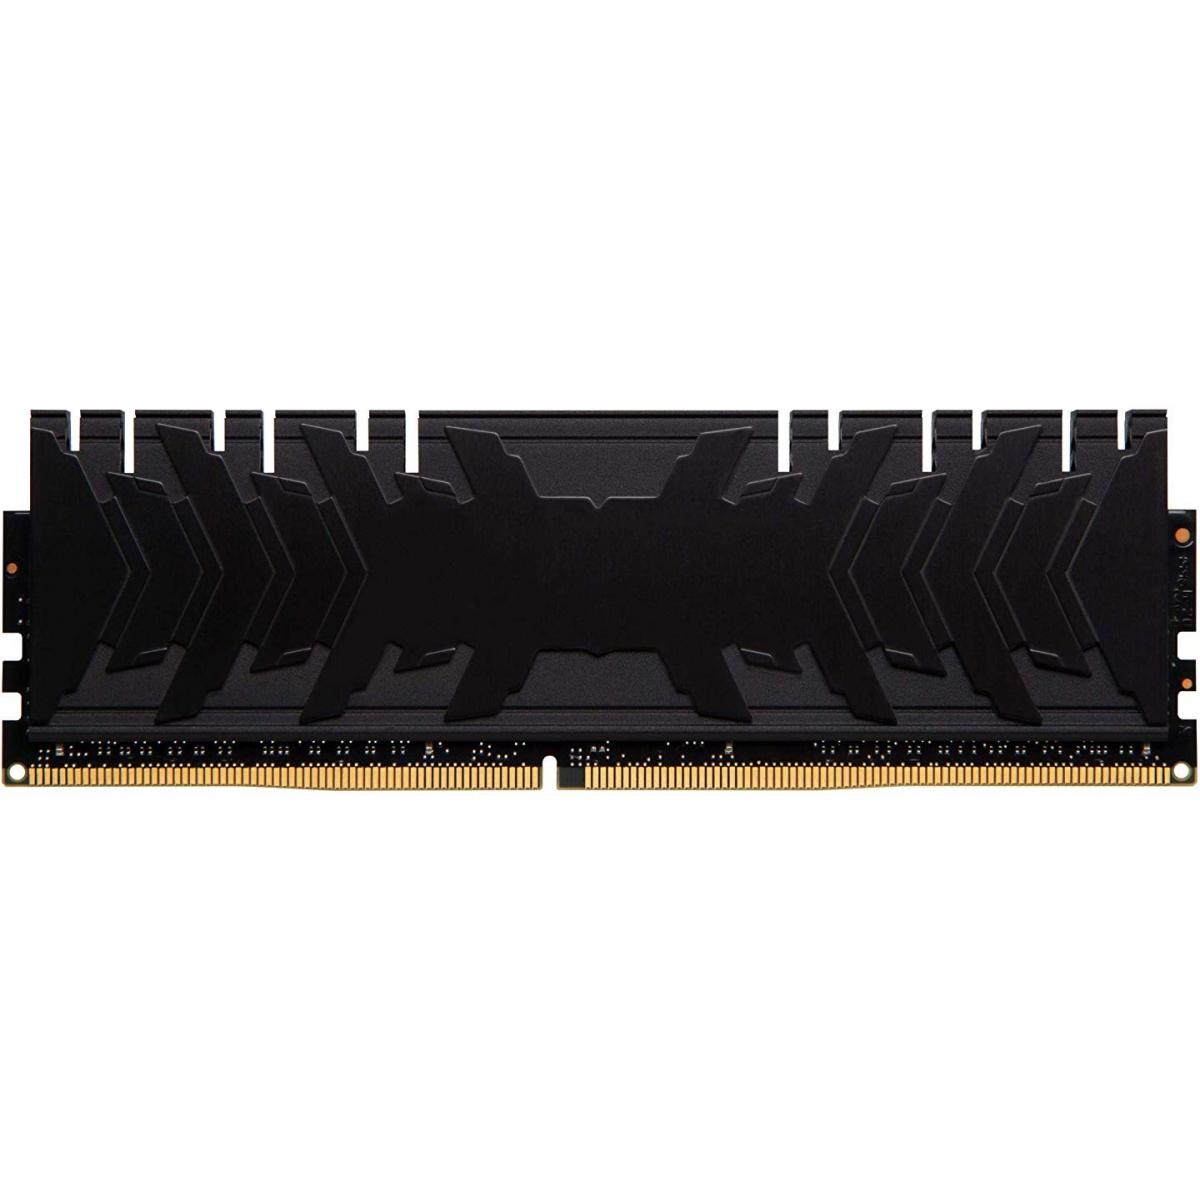 Memória DDR4 Kingston HyperX Predator, 16GB 2666MHZ,  HX426C13PB3/16